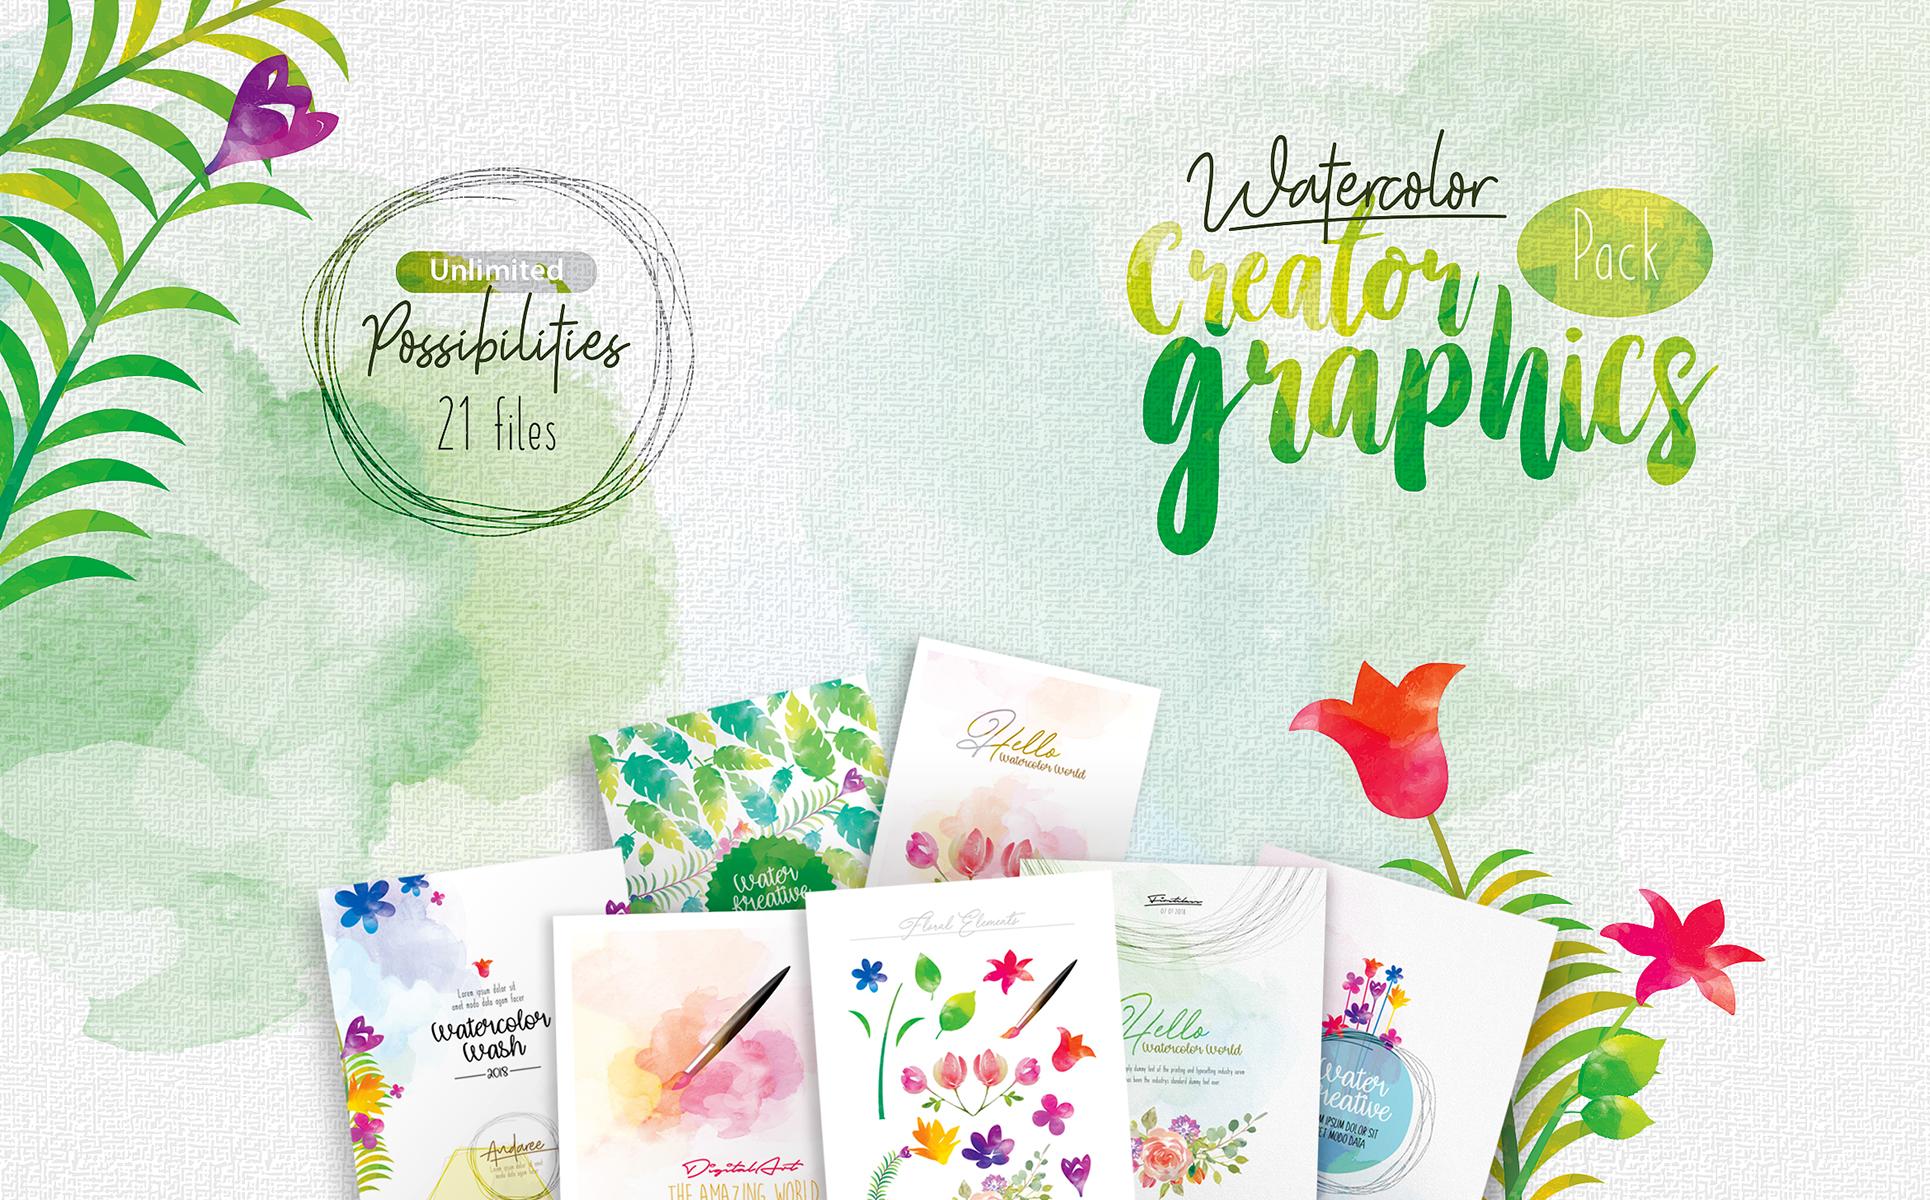 https://s3.tmimgcdn.com/templates/4714/scr/Watercolor%20Wash%20Creator%20Graphics%20Pack%20Floral%20Leaves%20Design%20Vector%20Illustration%20Creative%203.jpg